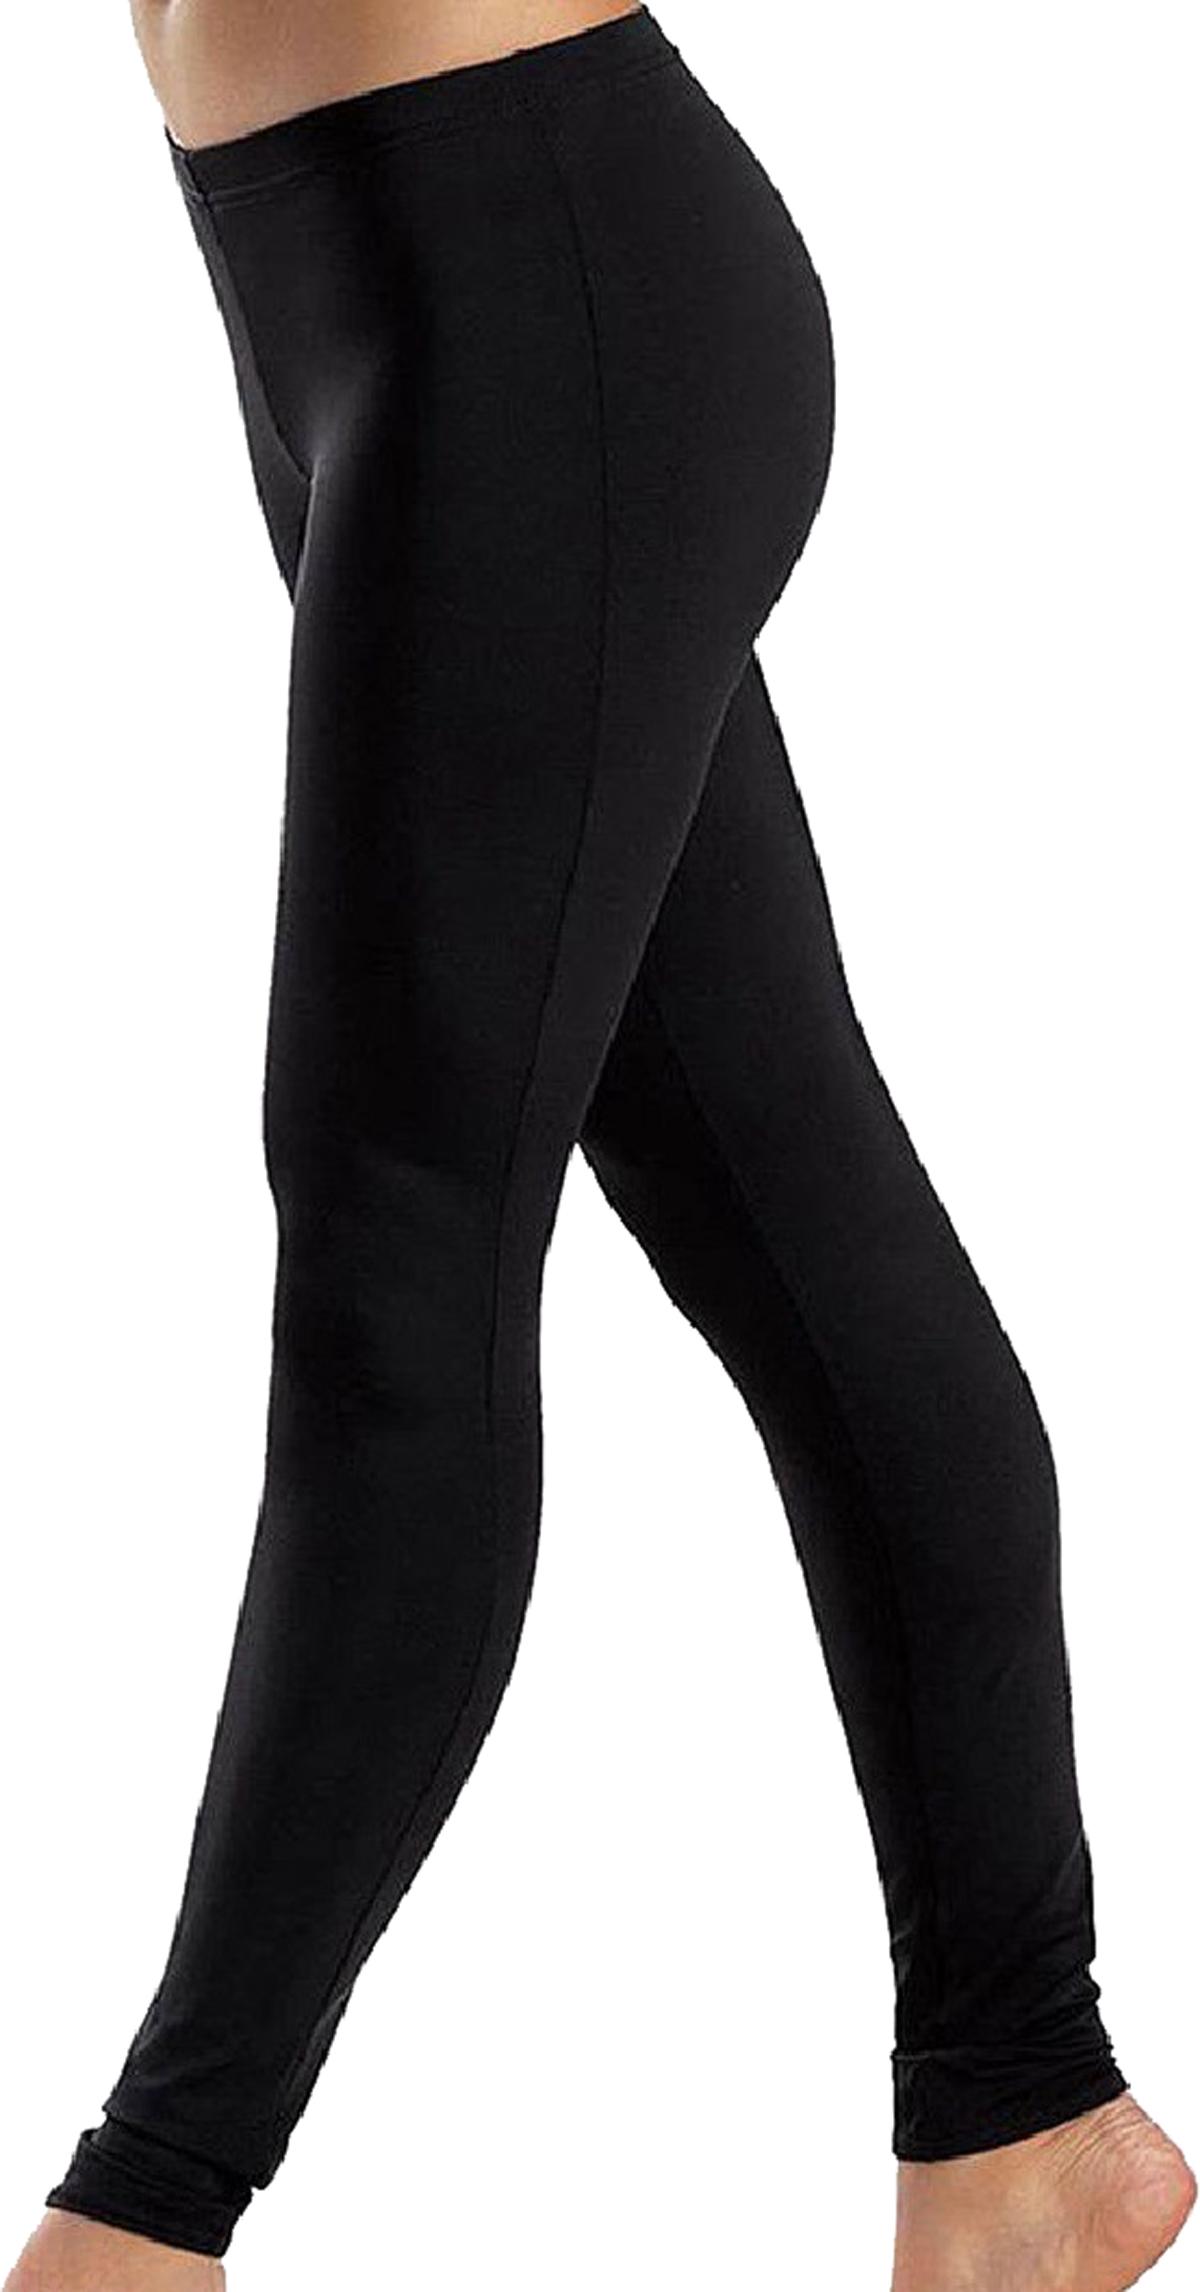 School Uniform Girls//Ladies Lycra Leggings Sports PE Pants Only Uniform® UK